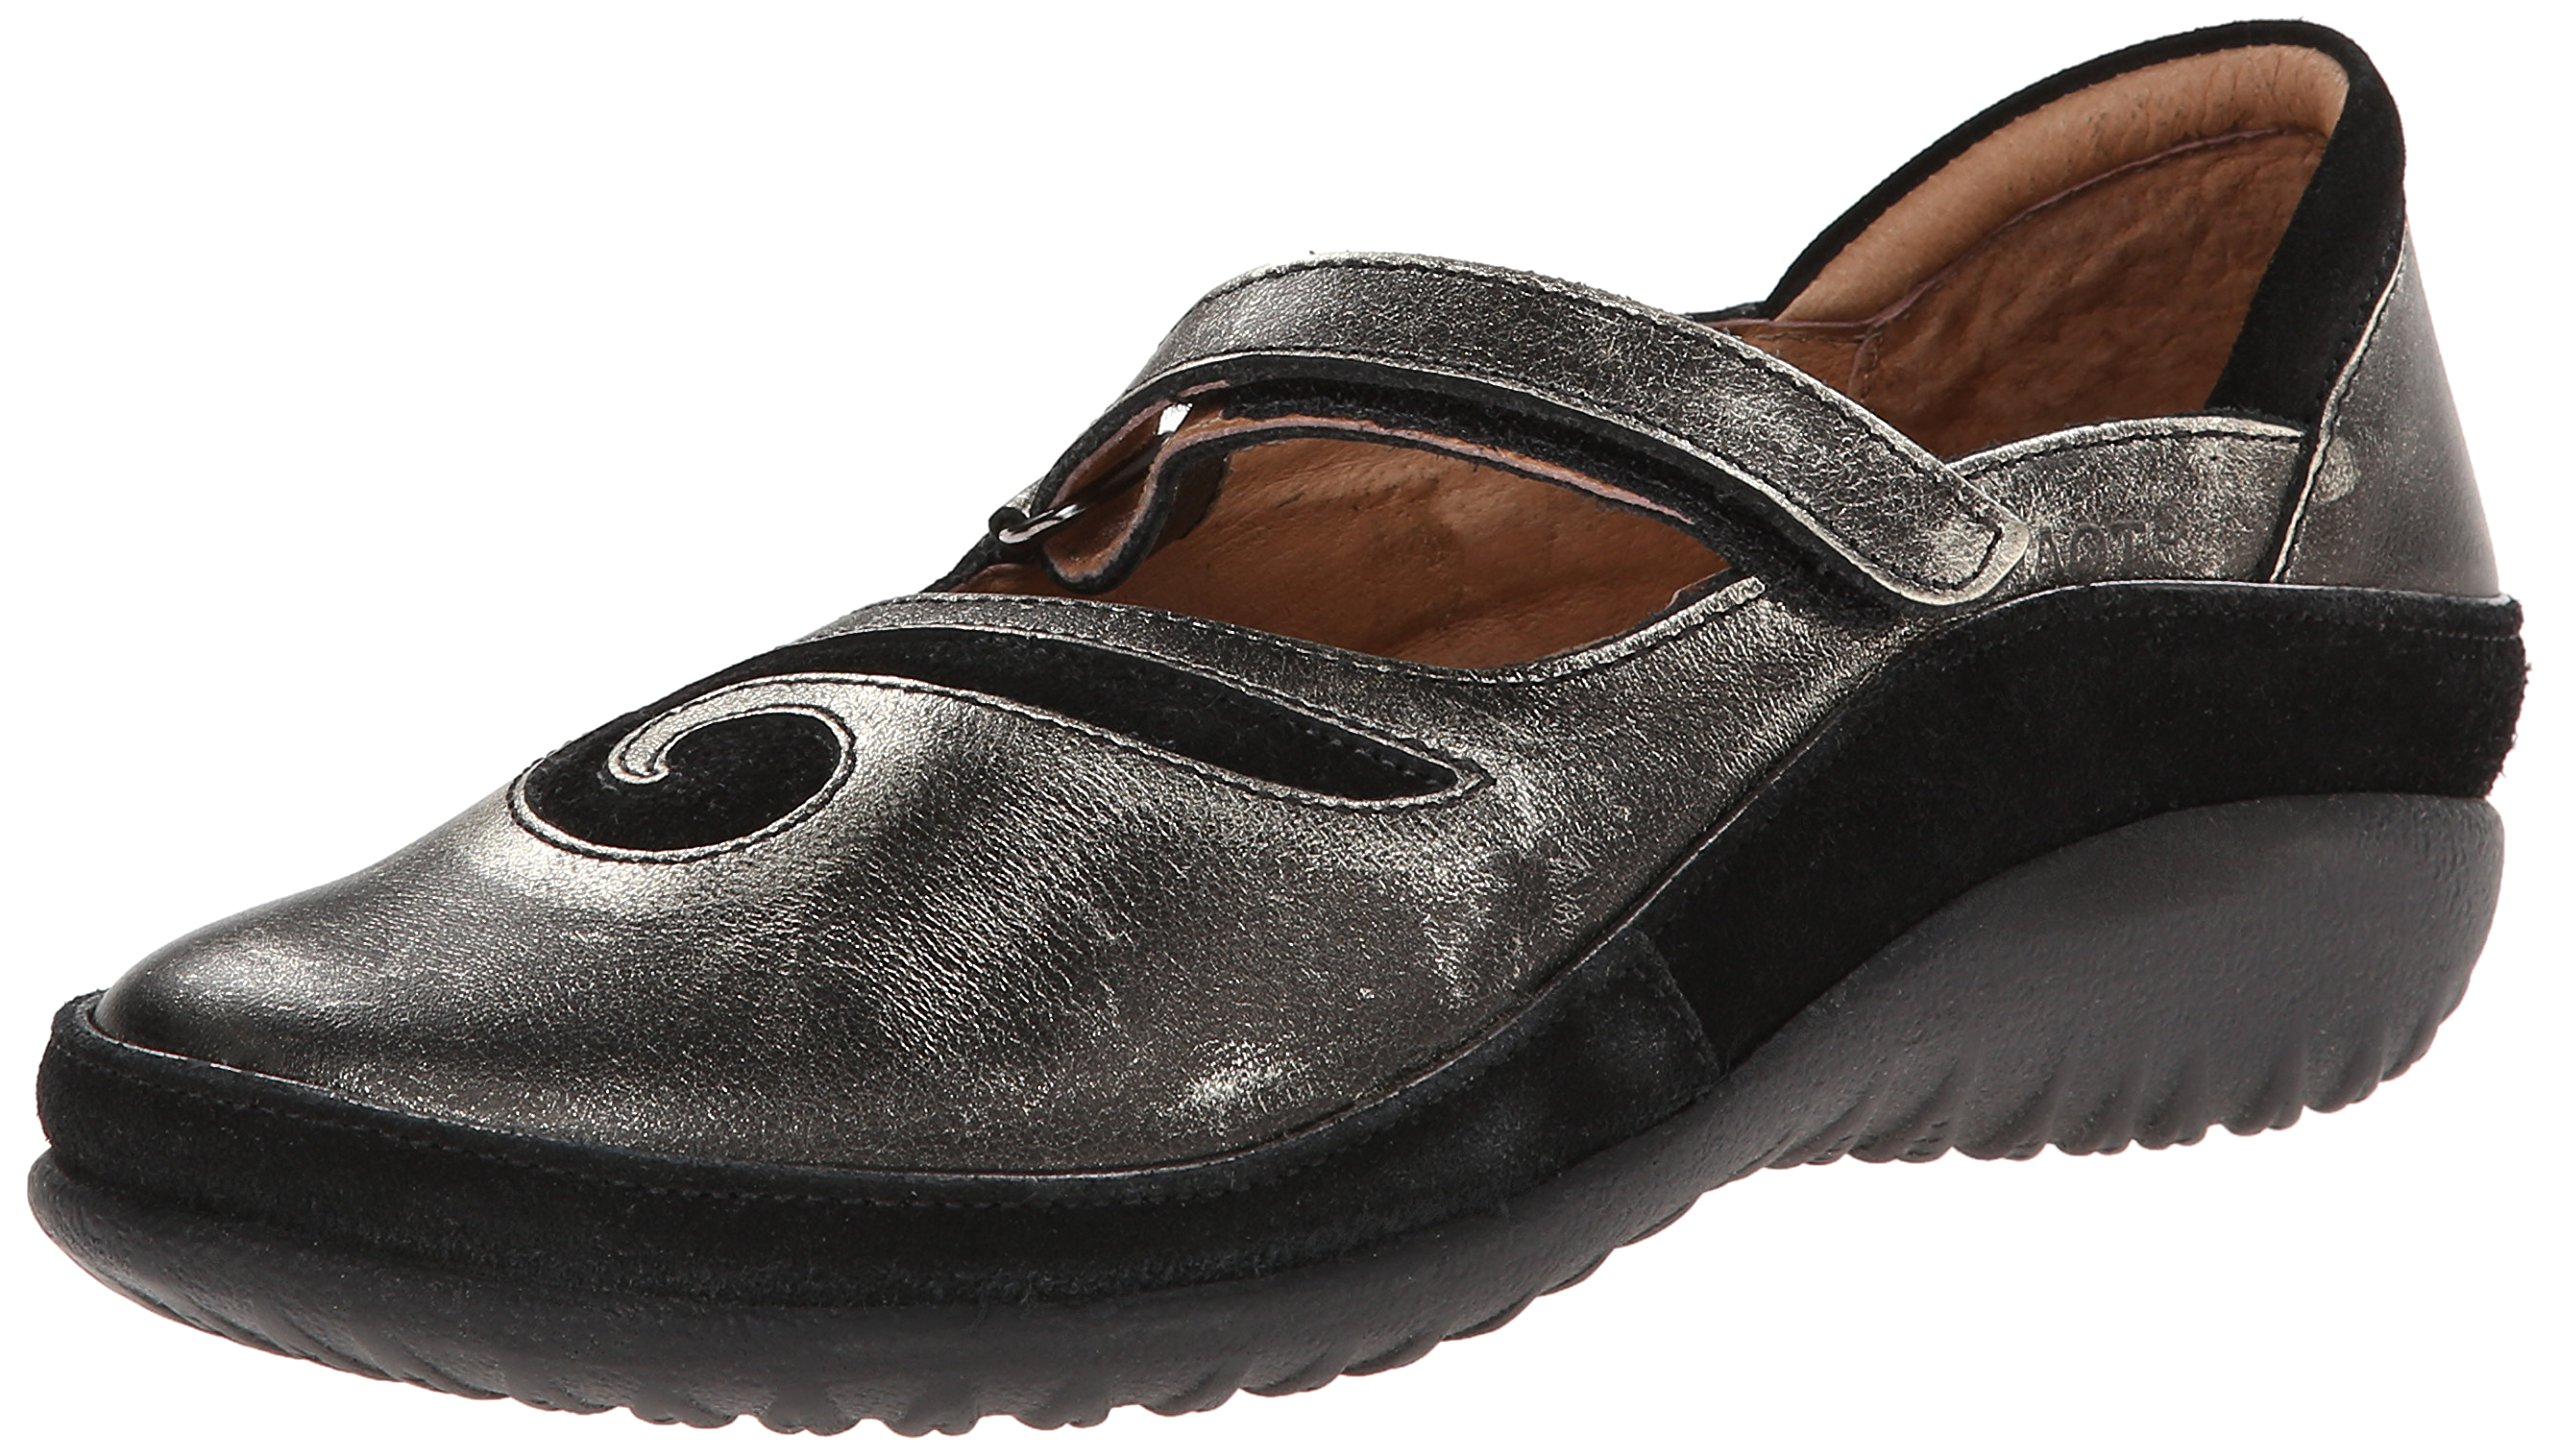 Naot Footwear Matai Metal Leather/Black Suede 37